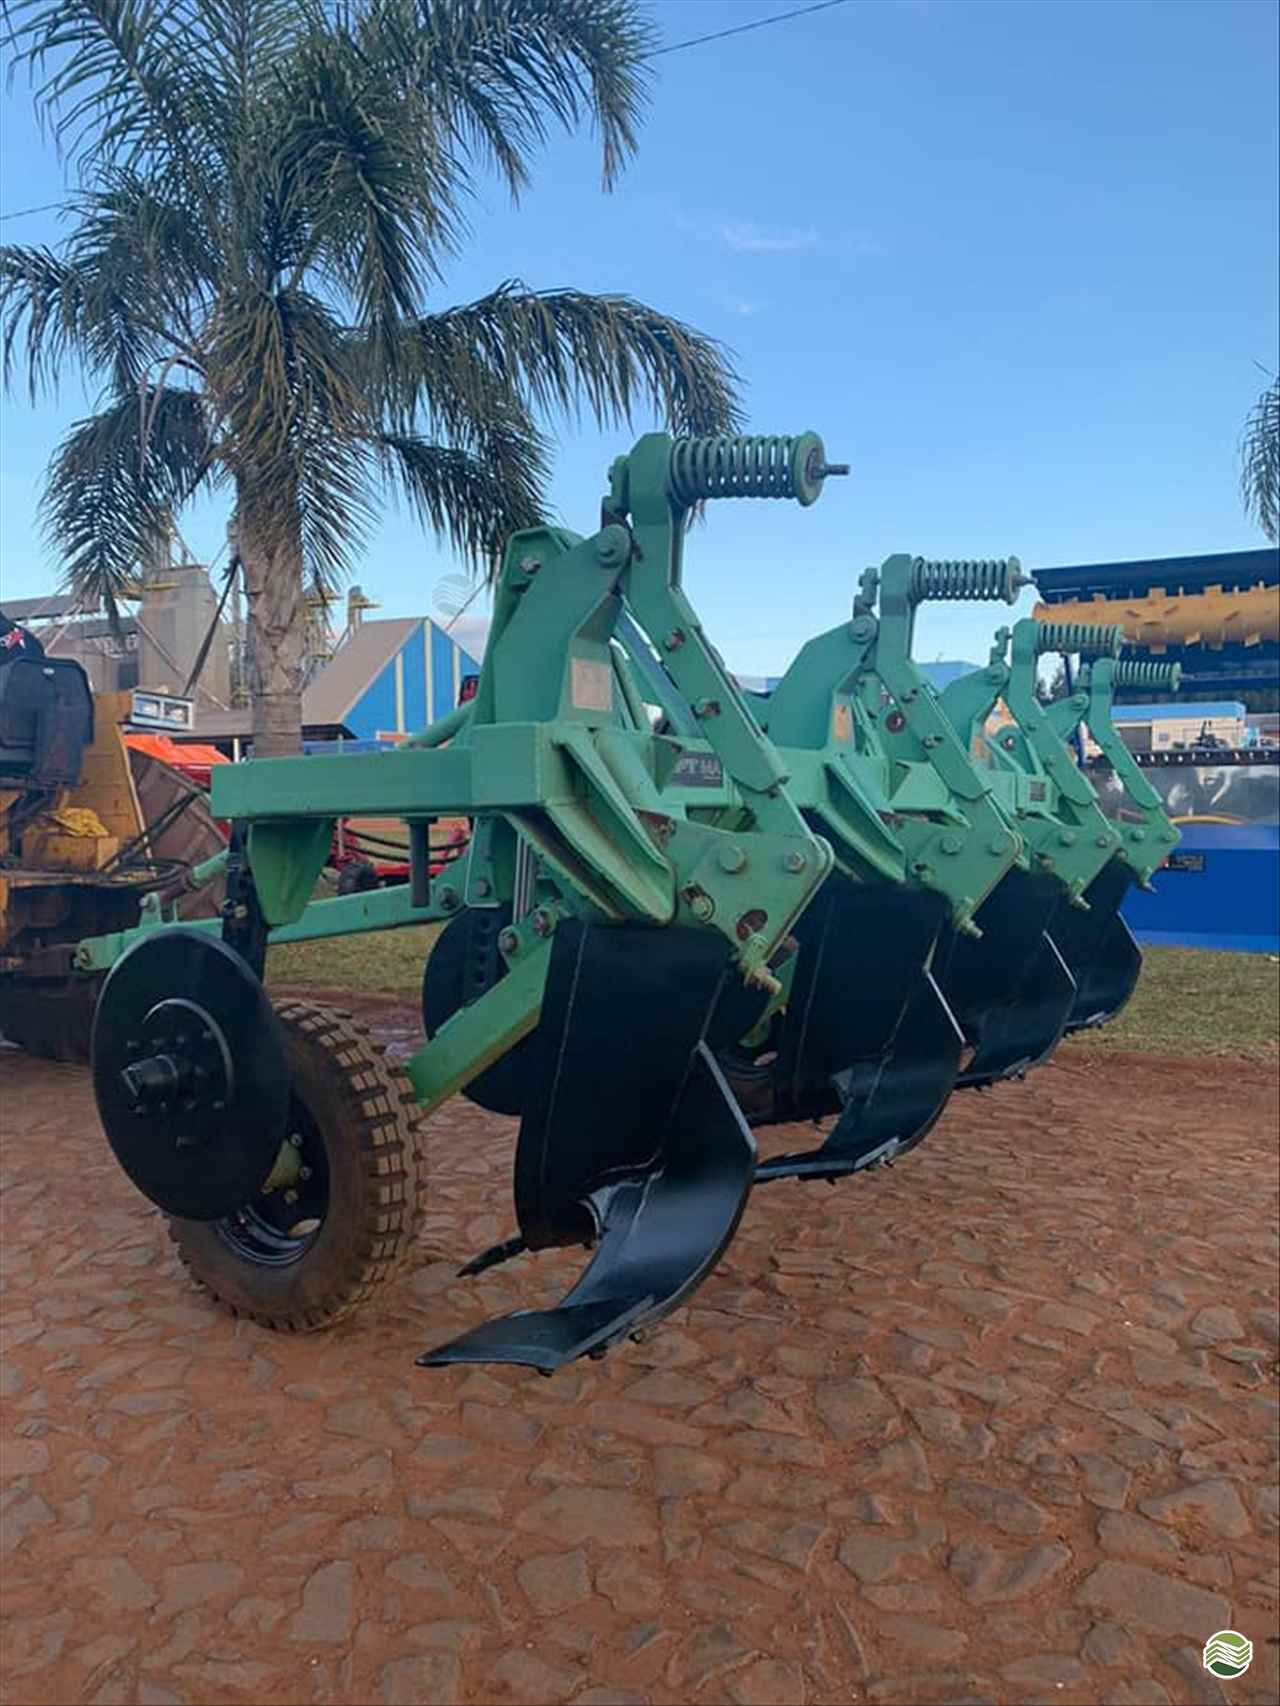 IMPLEMENTOS AGRICOLAS DESCOMPACTADOR AREADOR DE SOLO Starmaq Implementos Agrícolas CRUZ ALTA RIO GRANDE DO SUL RS